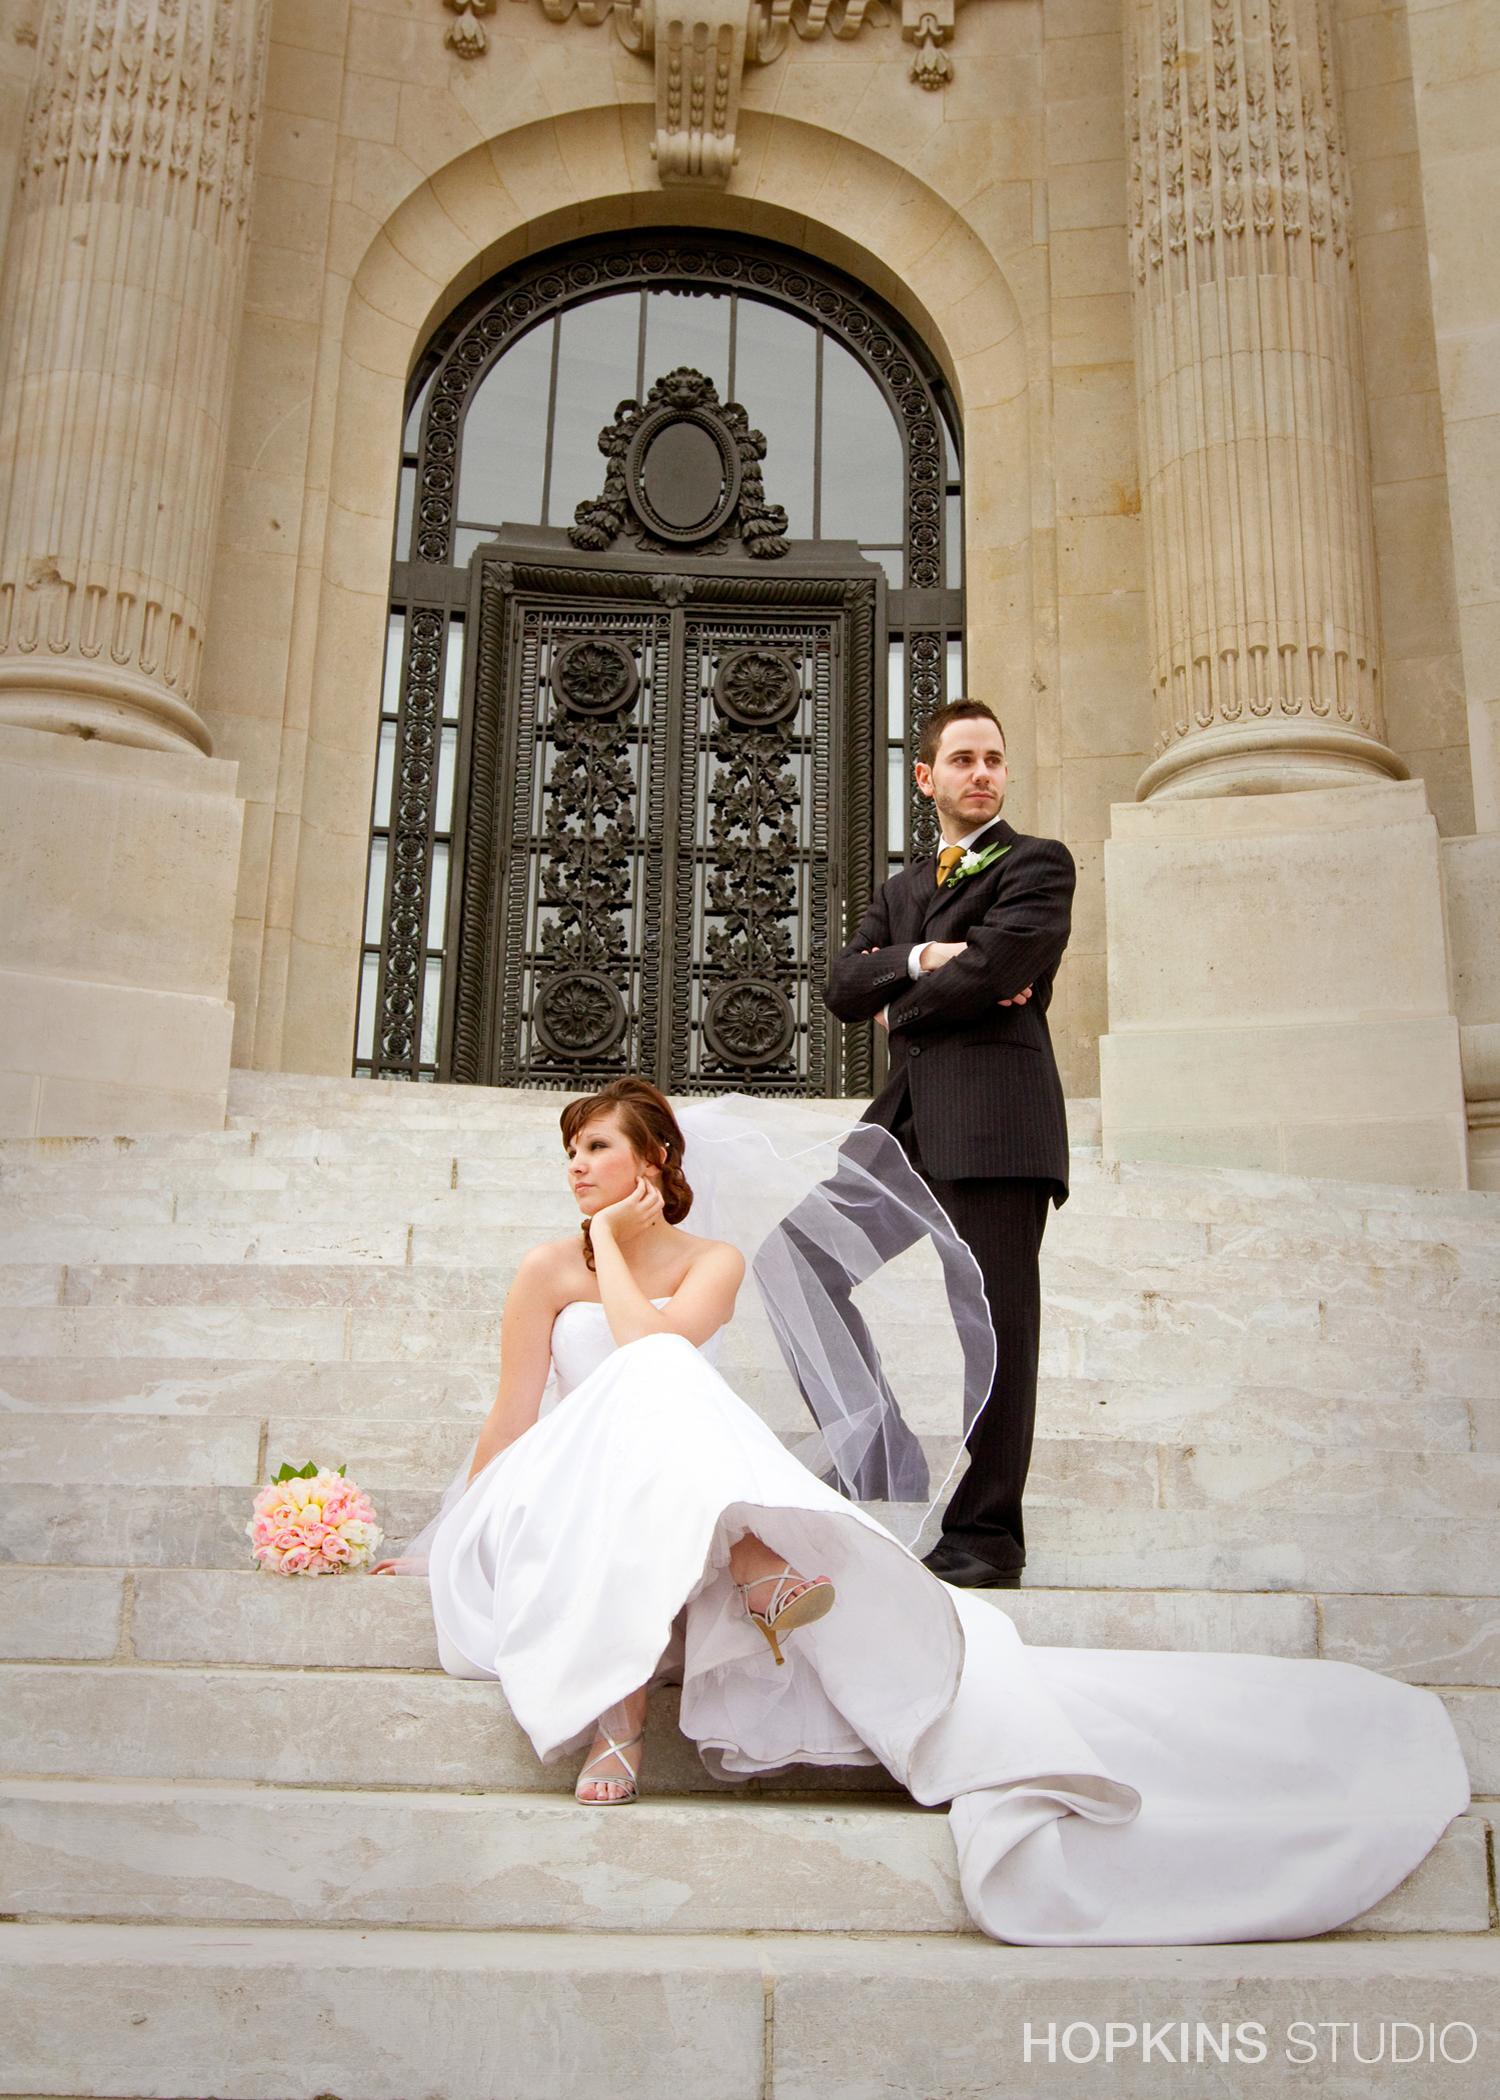 wedding-photography-Eiffel-Tower-Notre-Dame-Paris_18.jpg